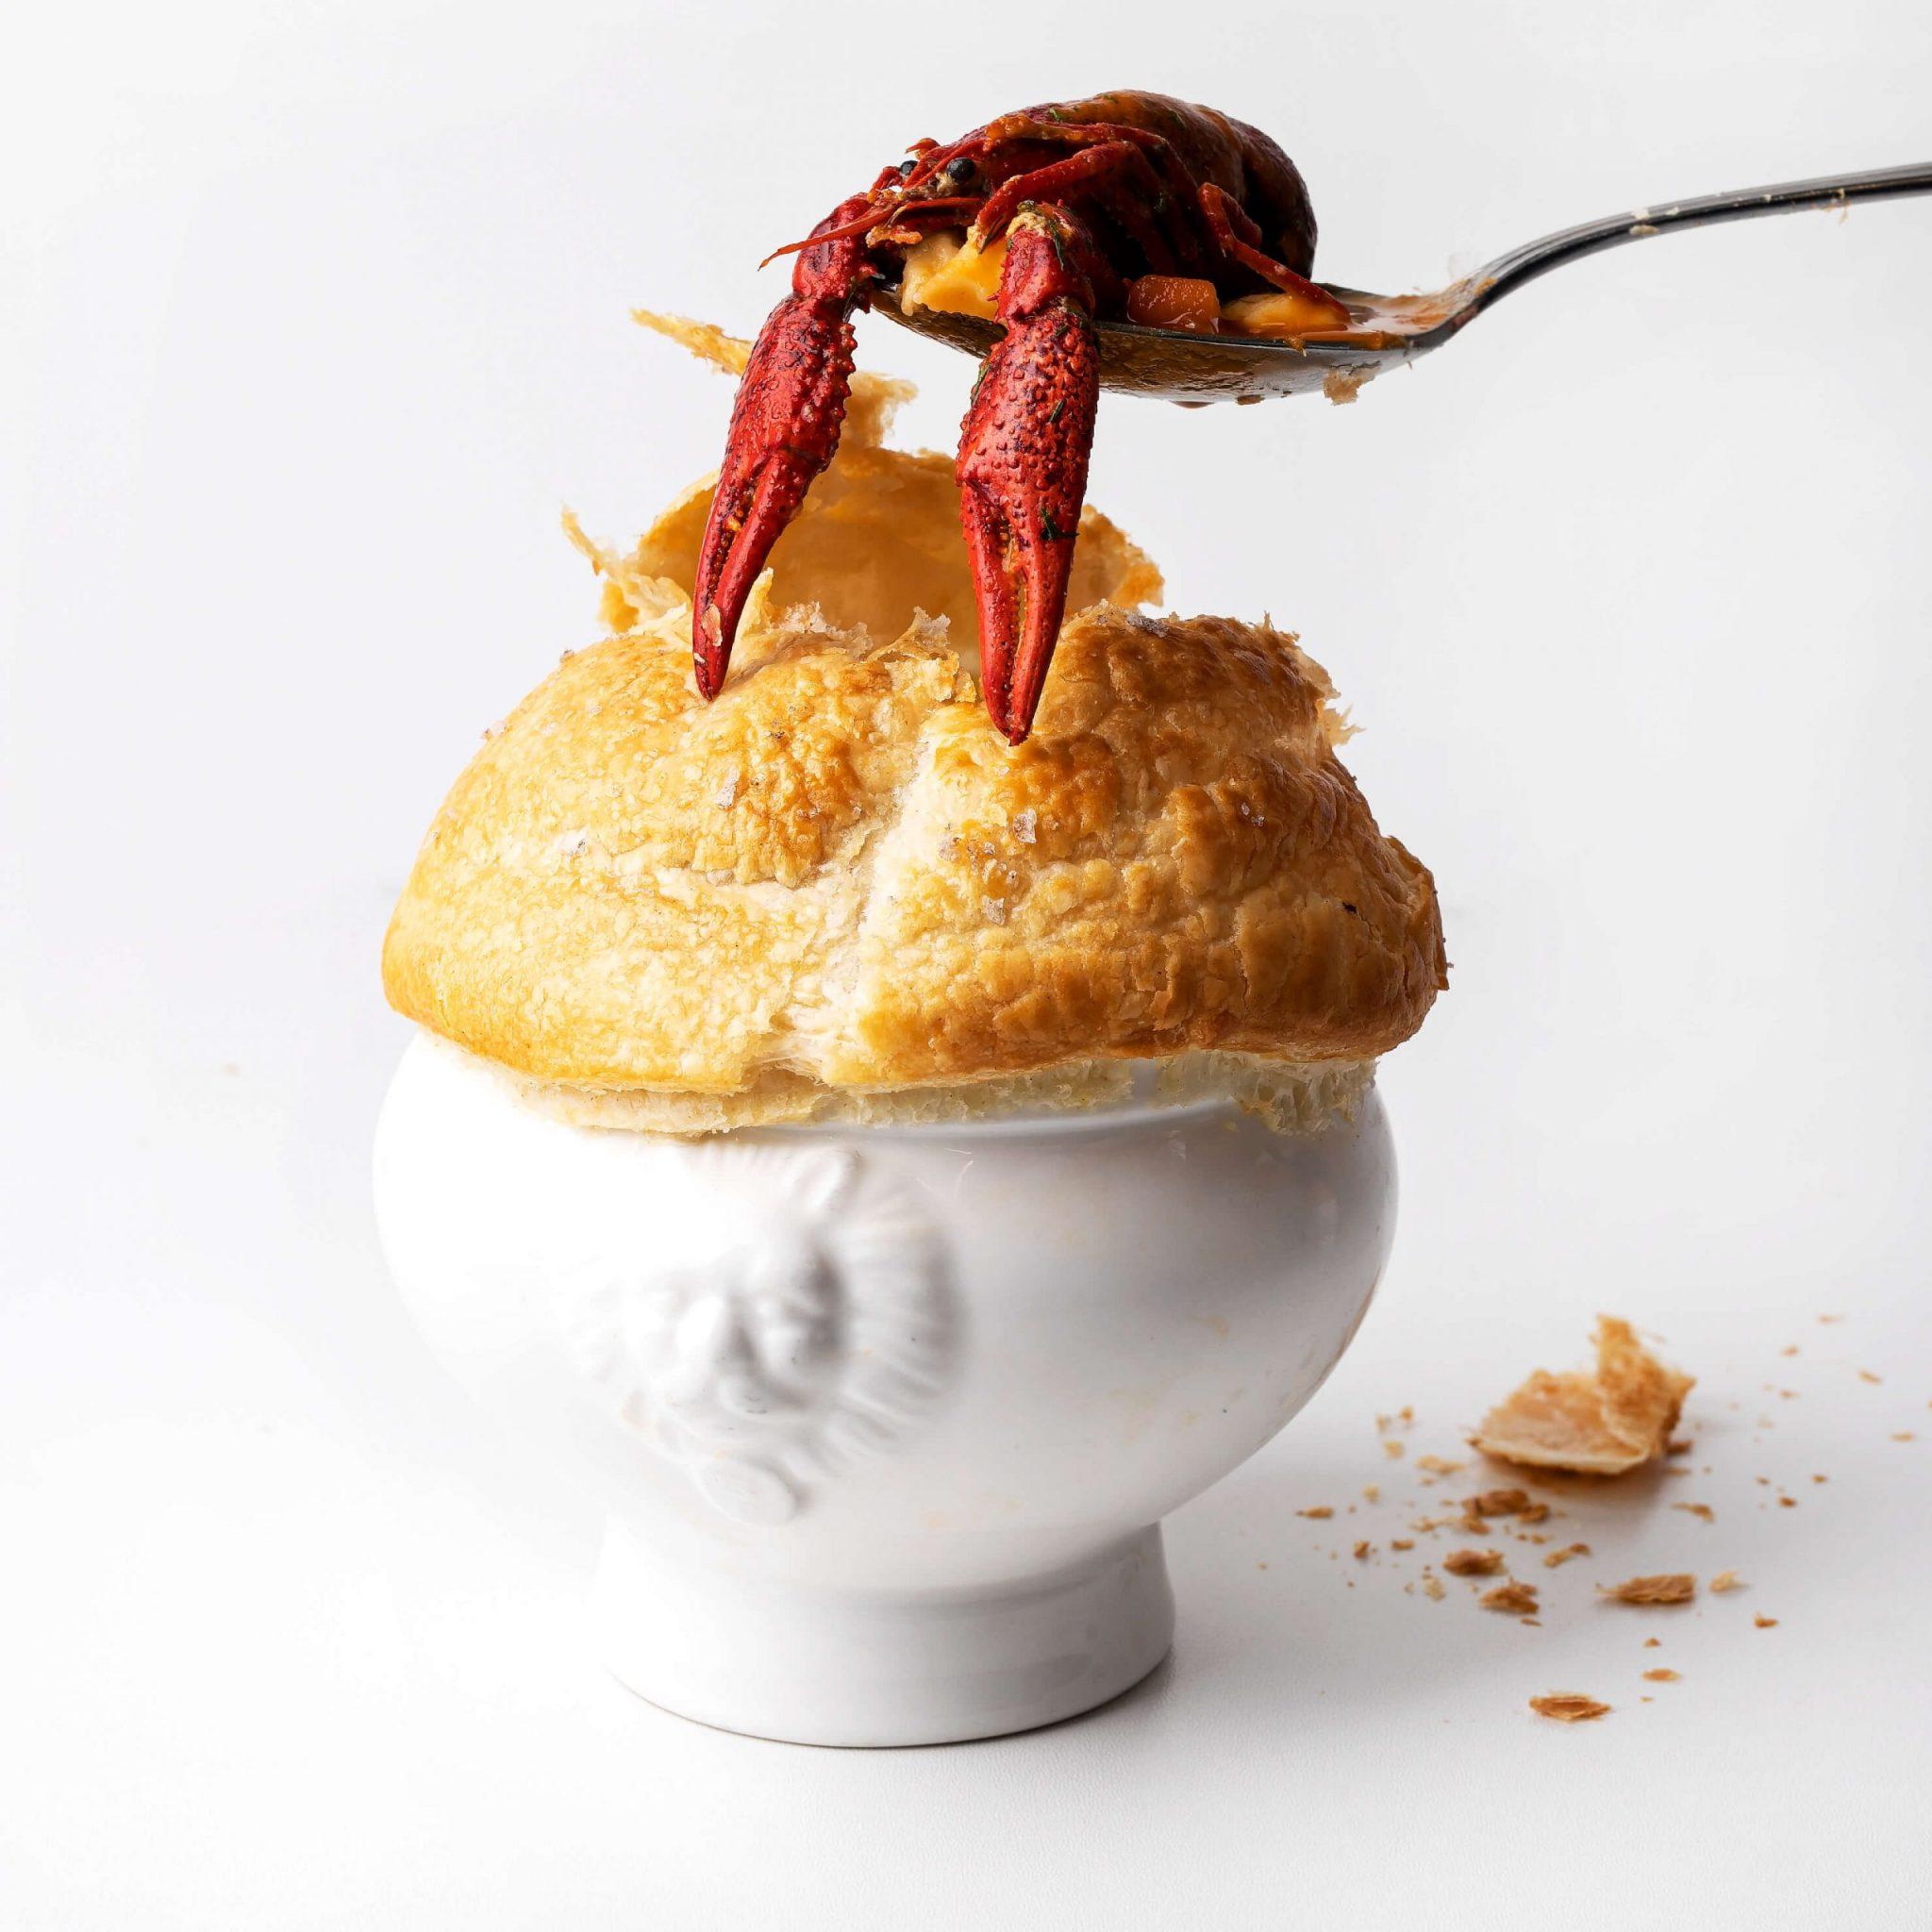 zupa rakowa fot. Joanna Ogorek 2 1 scaled - World Food Travel Day - Kashubian crayfish soup recipe